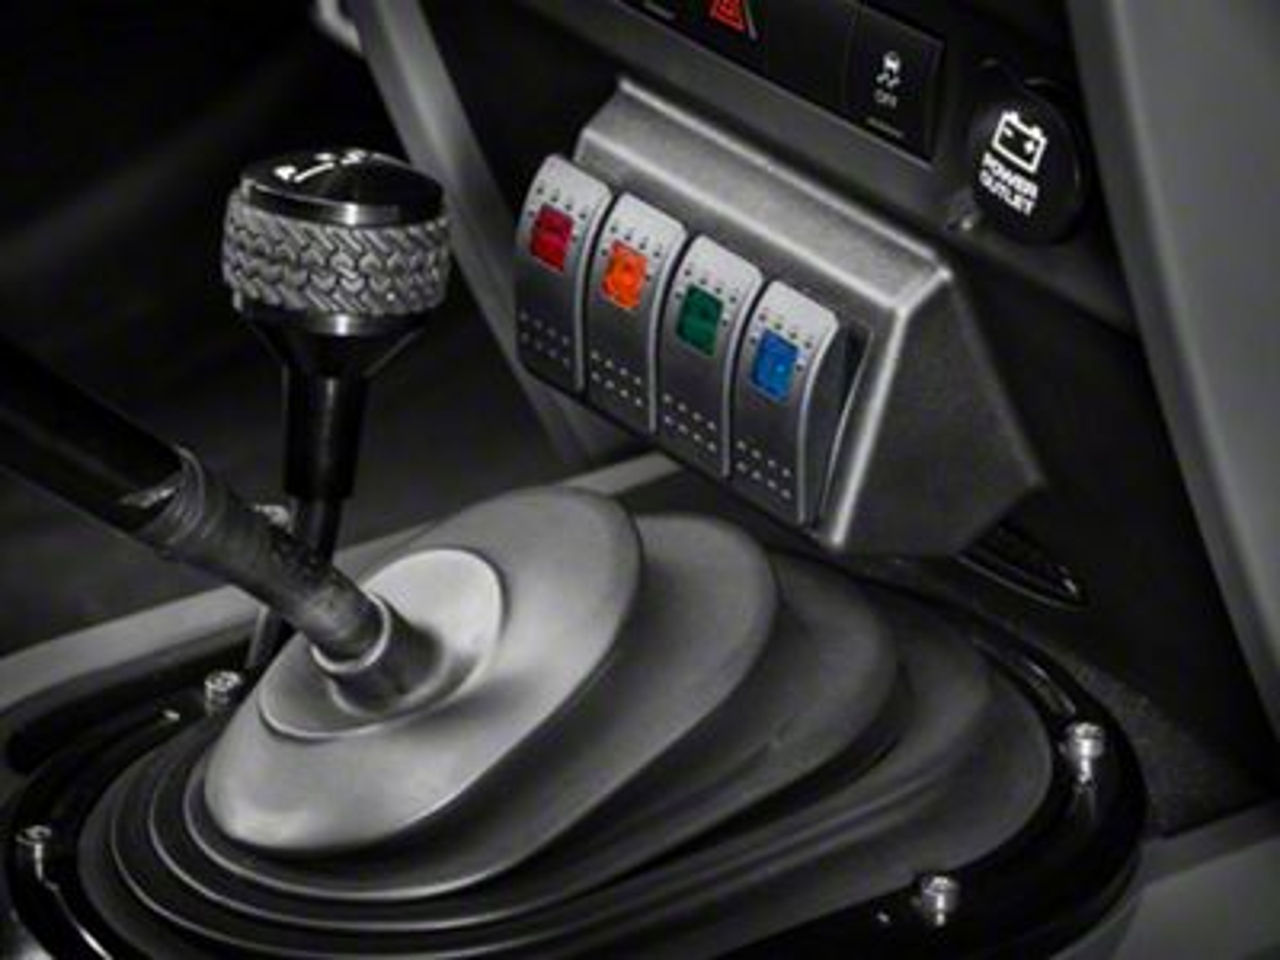 Dash Switch Panel - Lower (07-10 Jeep Wrangler JK)